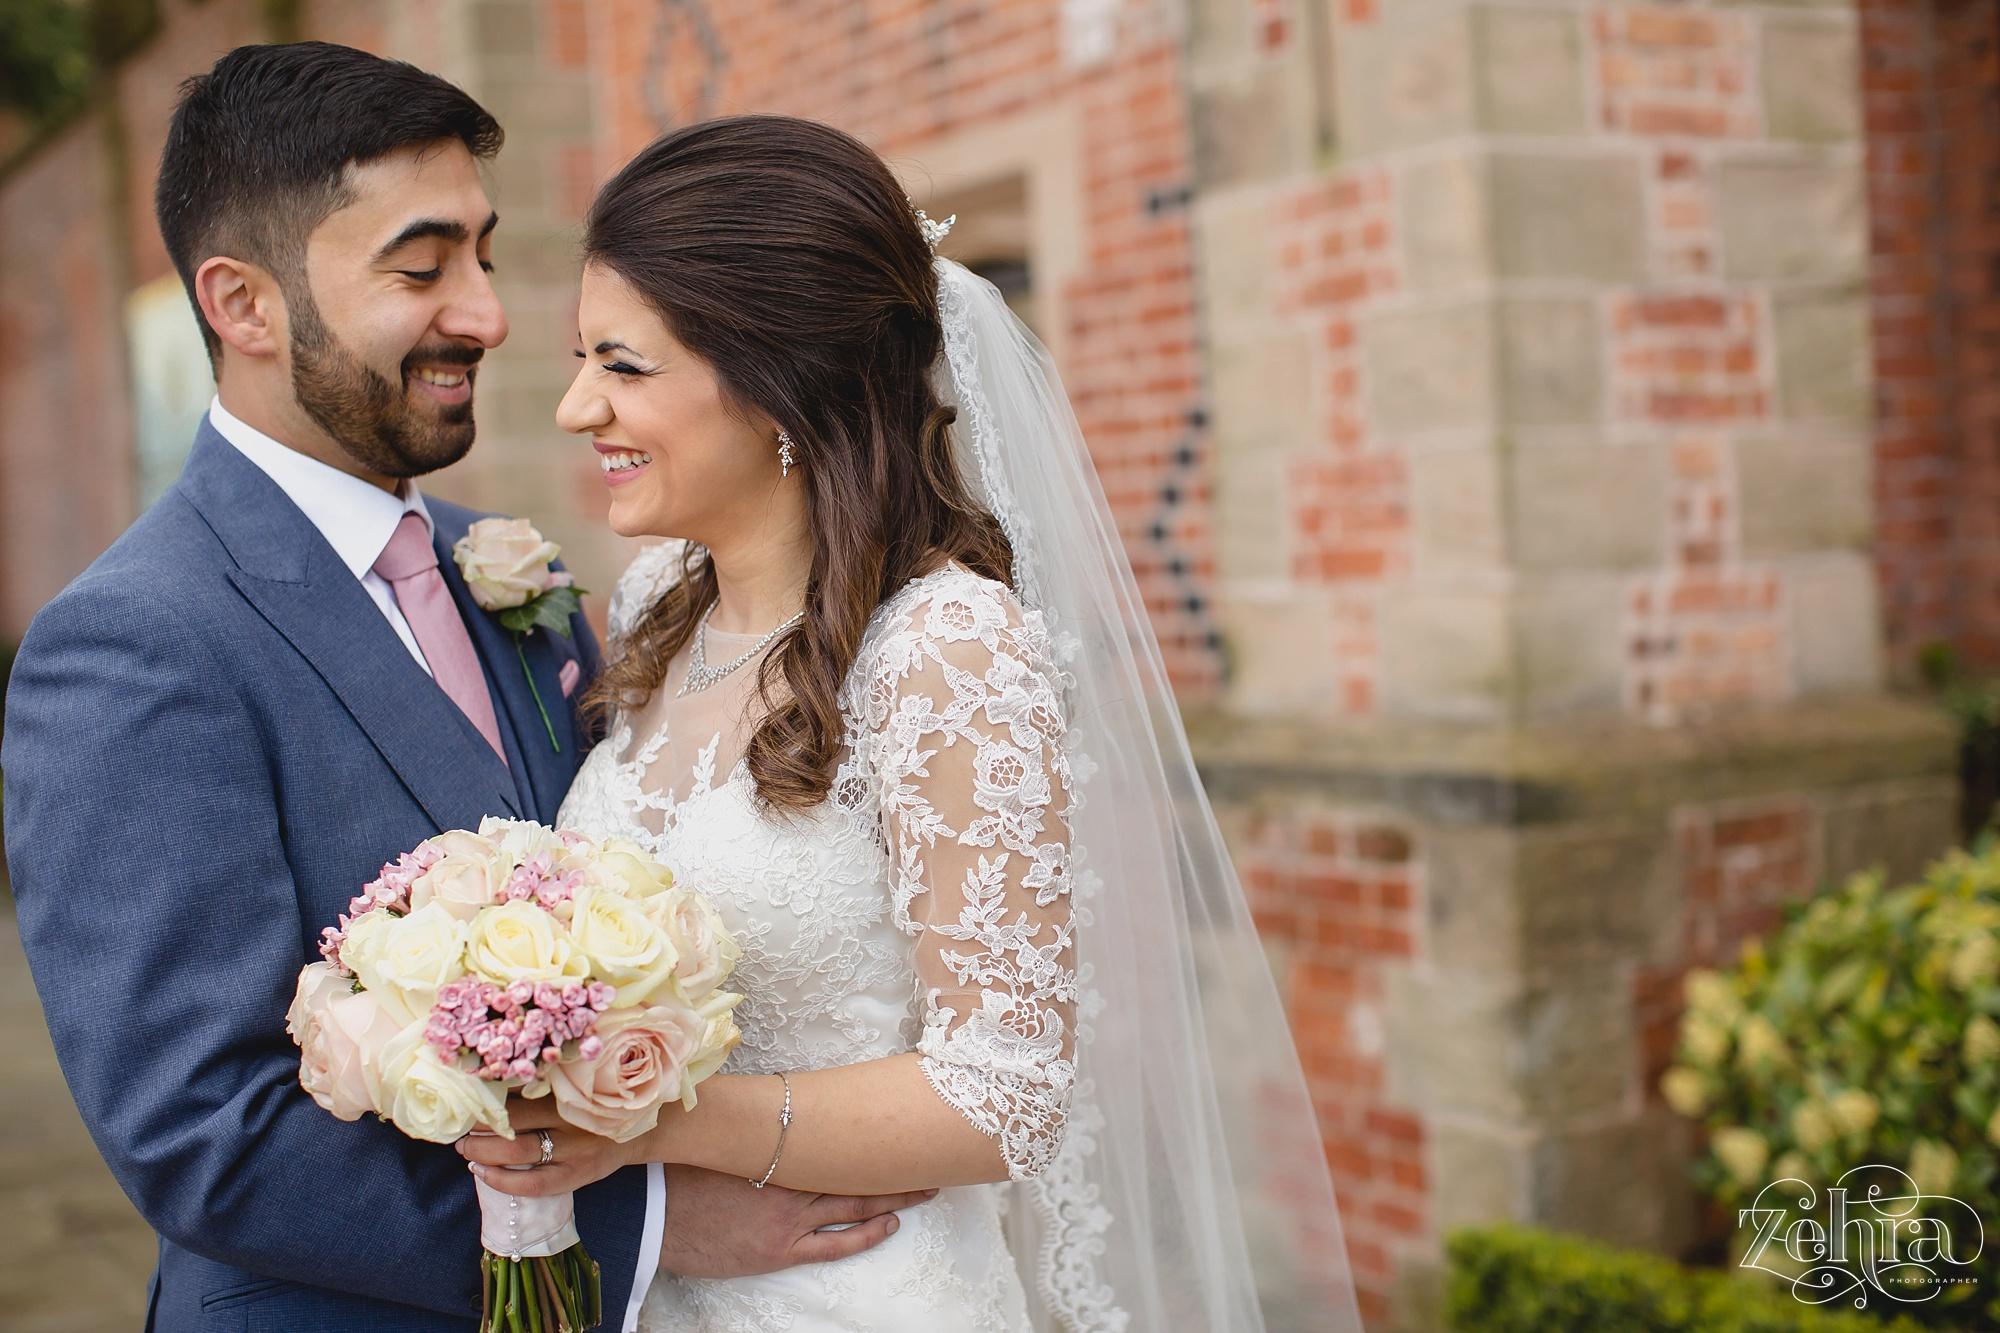 zehra photographer mere cheshire wedding_0021.jpg